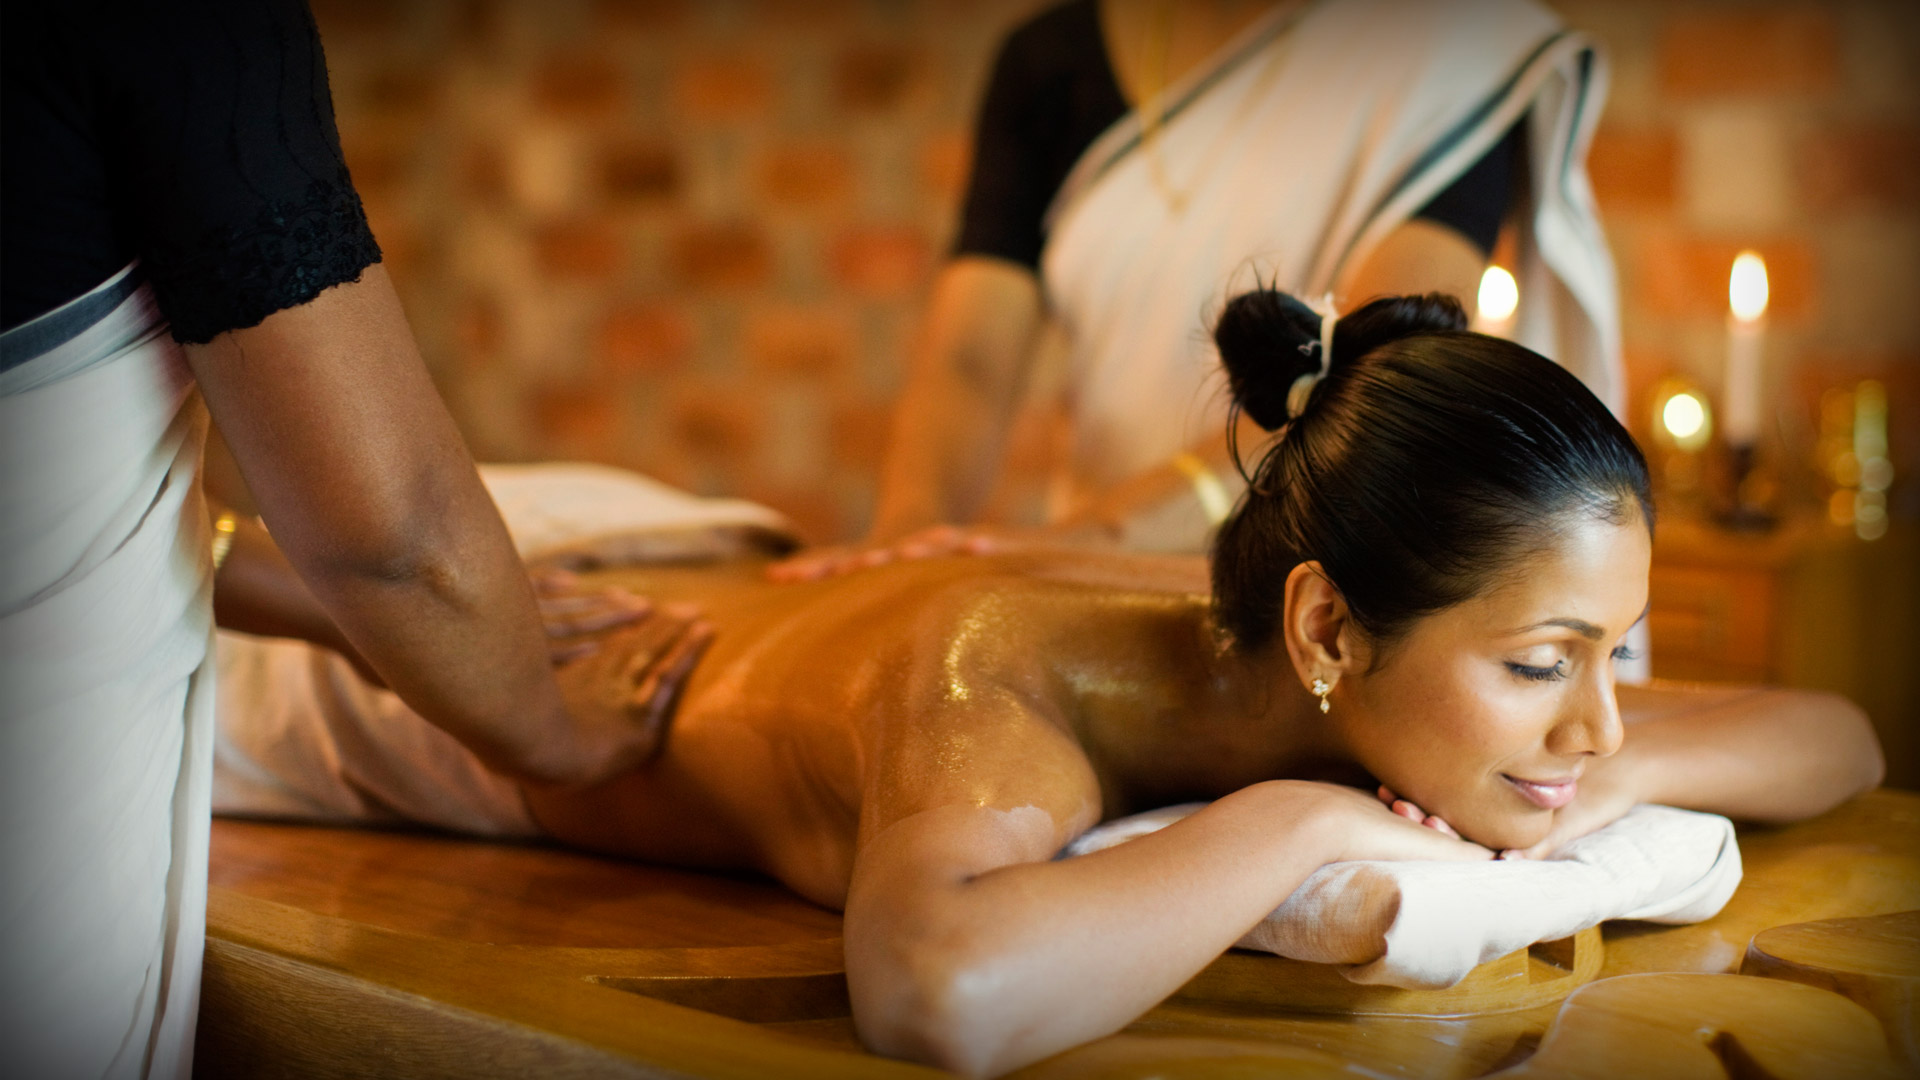 Тело видео тайского голого массажа